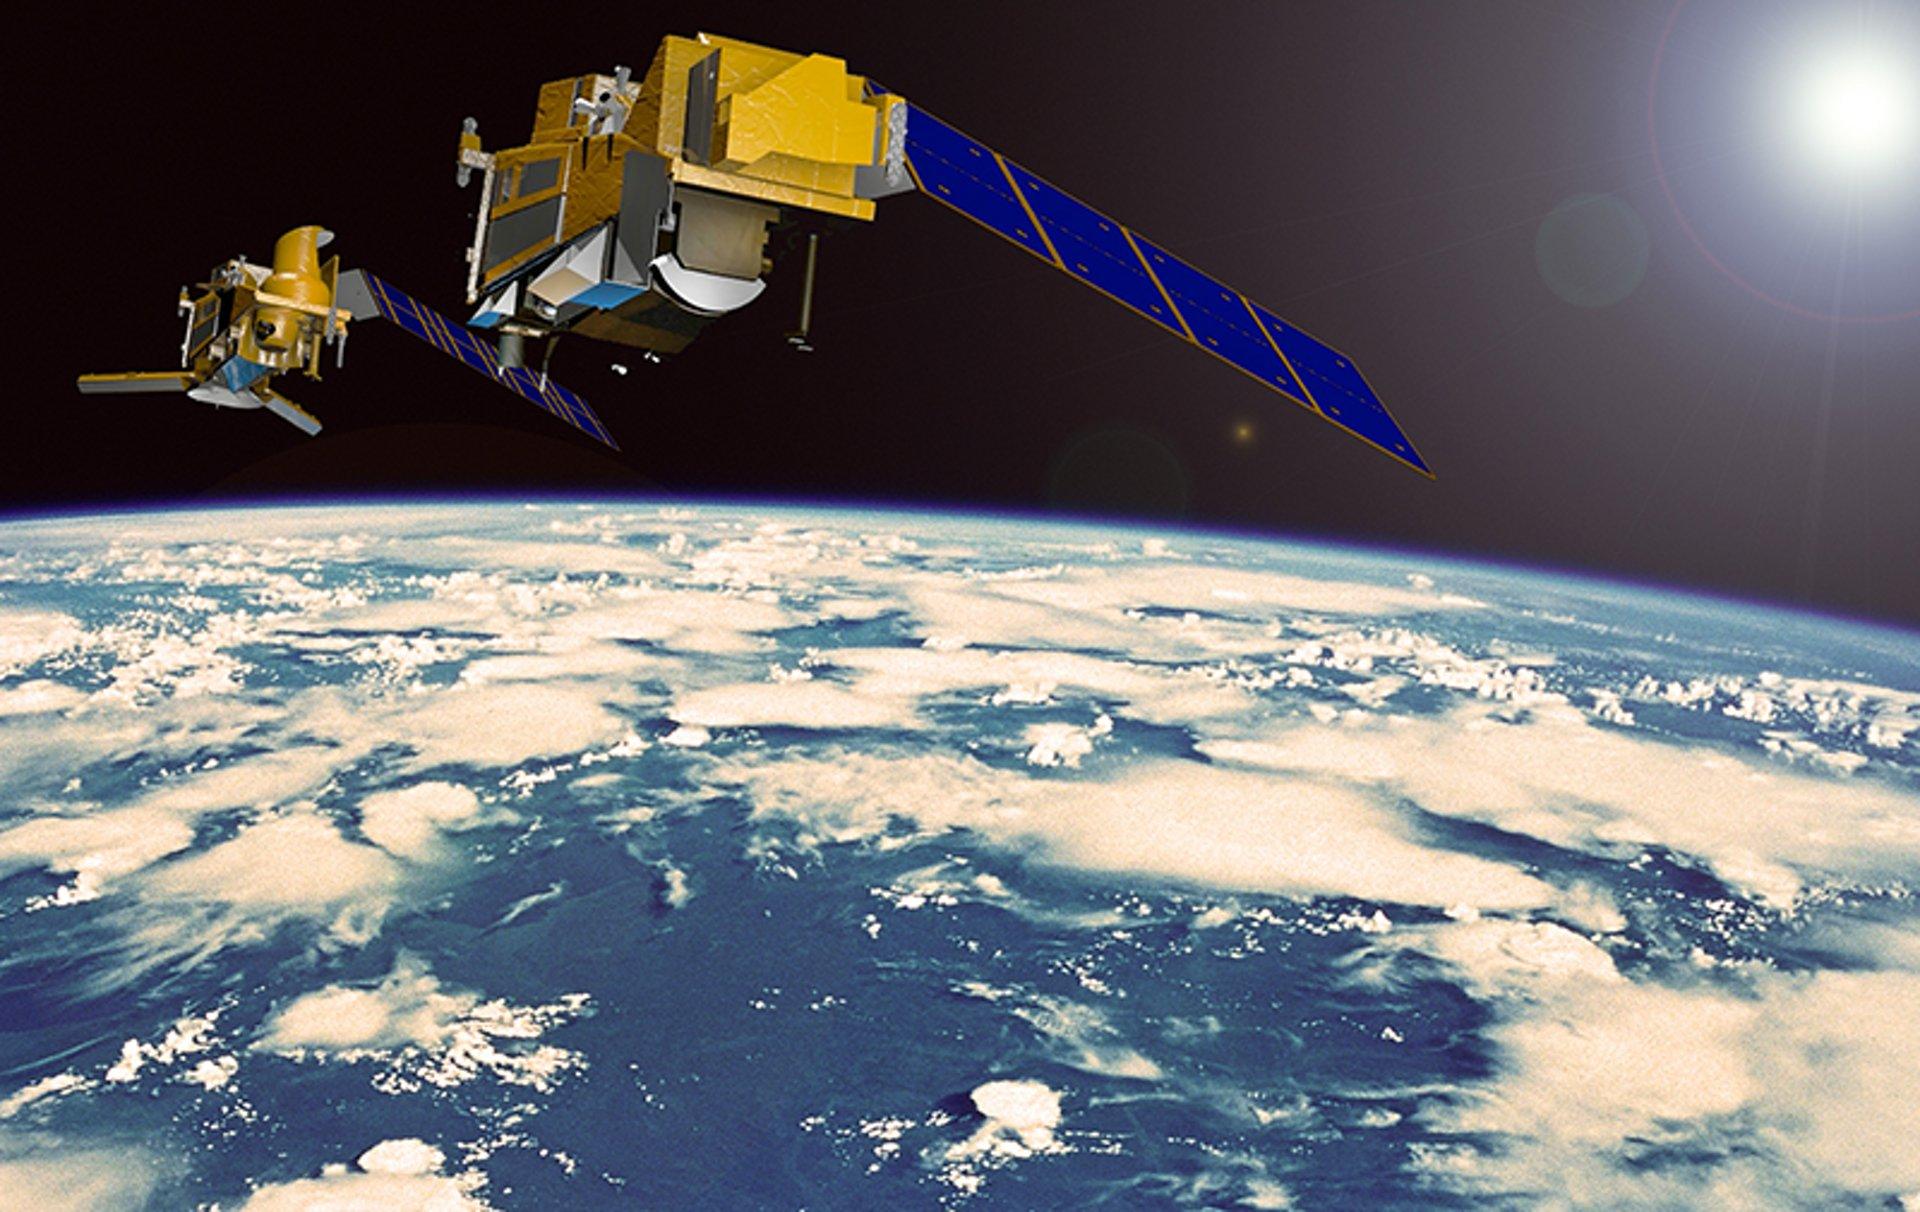 MetOp-SG will deliver enhanced meteorological observations